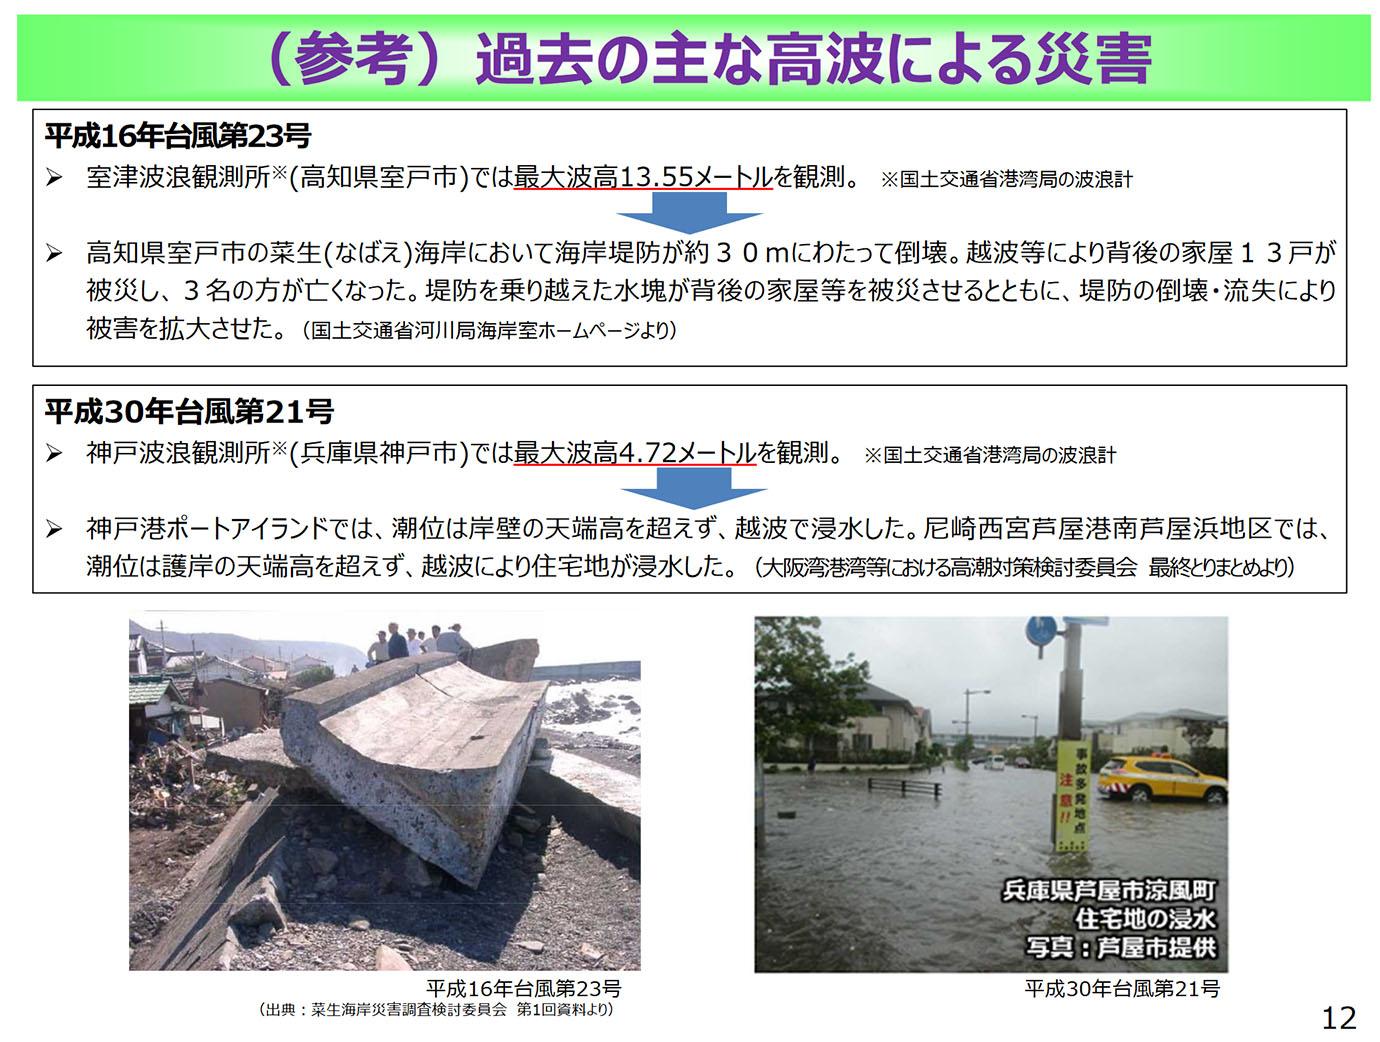 typhoon-emergency-evacuation-news7